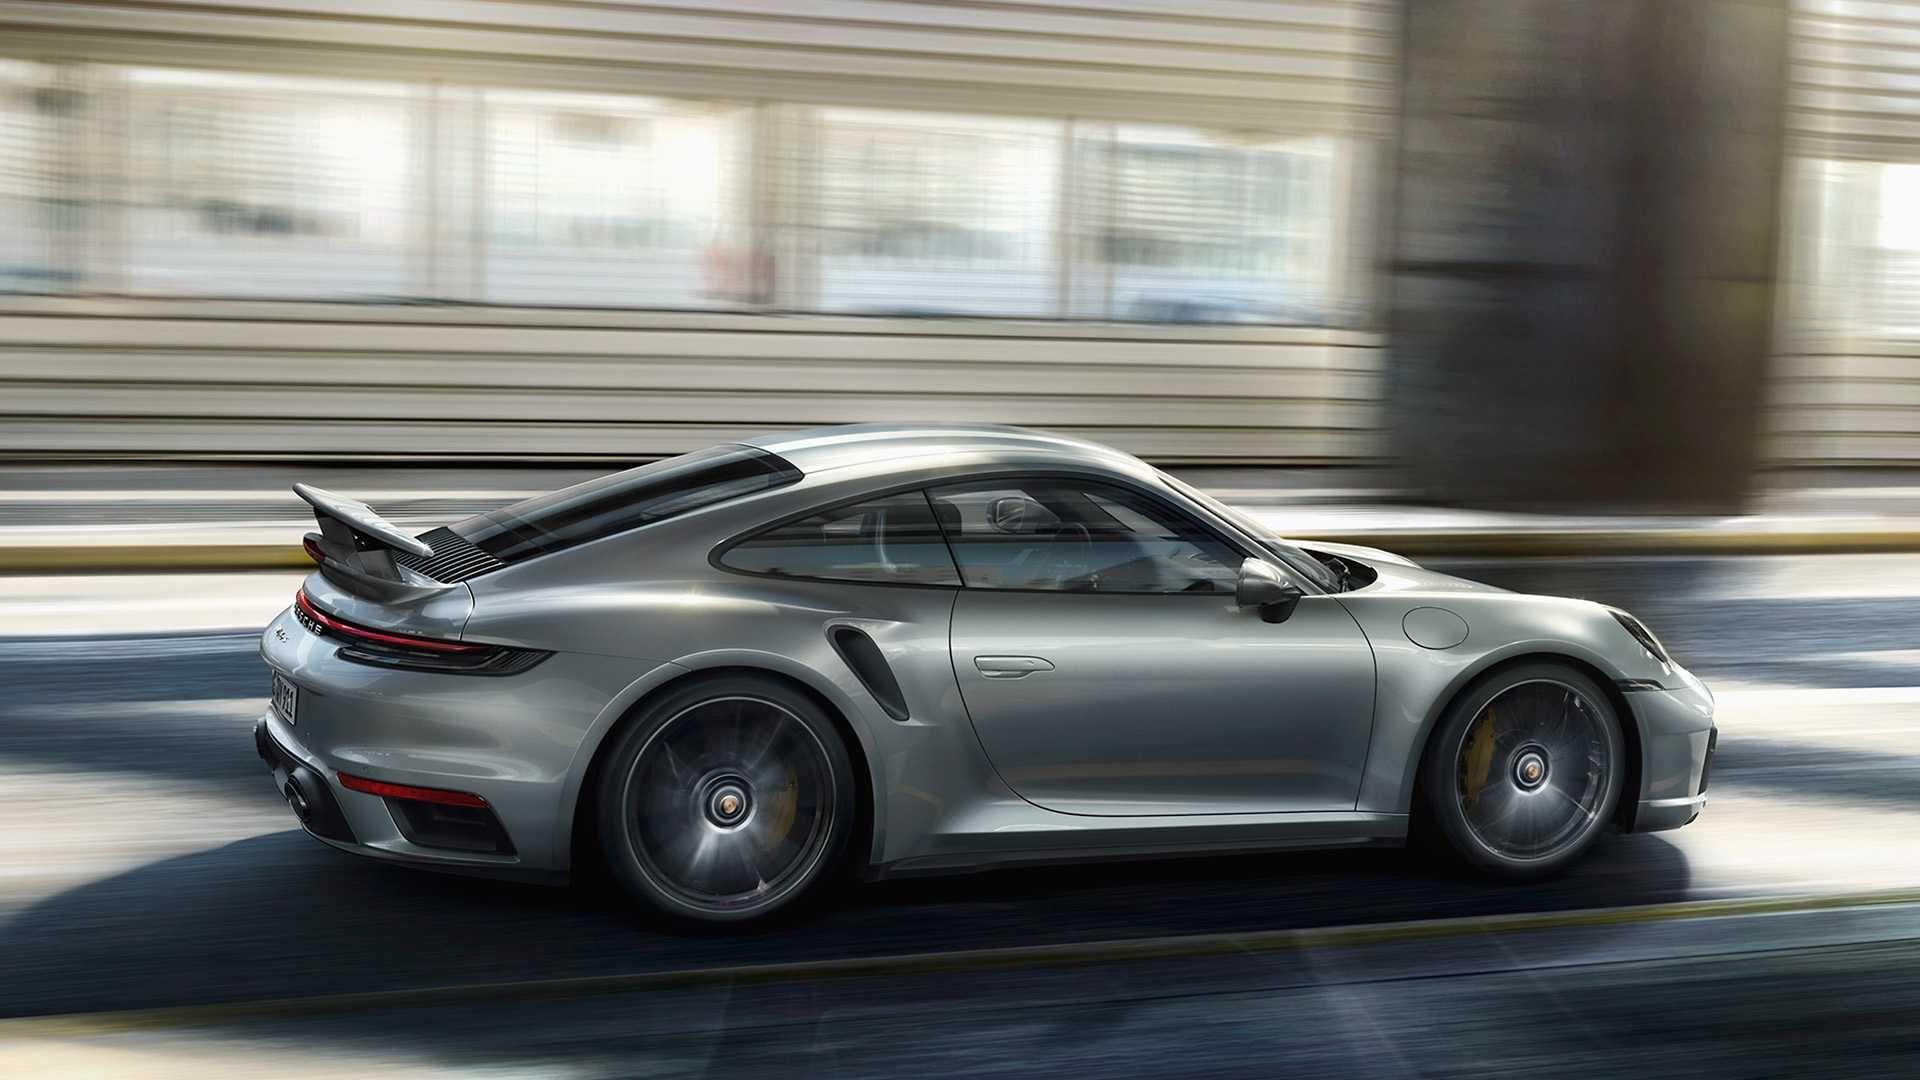 Porsche-911-Turbo-S-2020-2